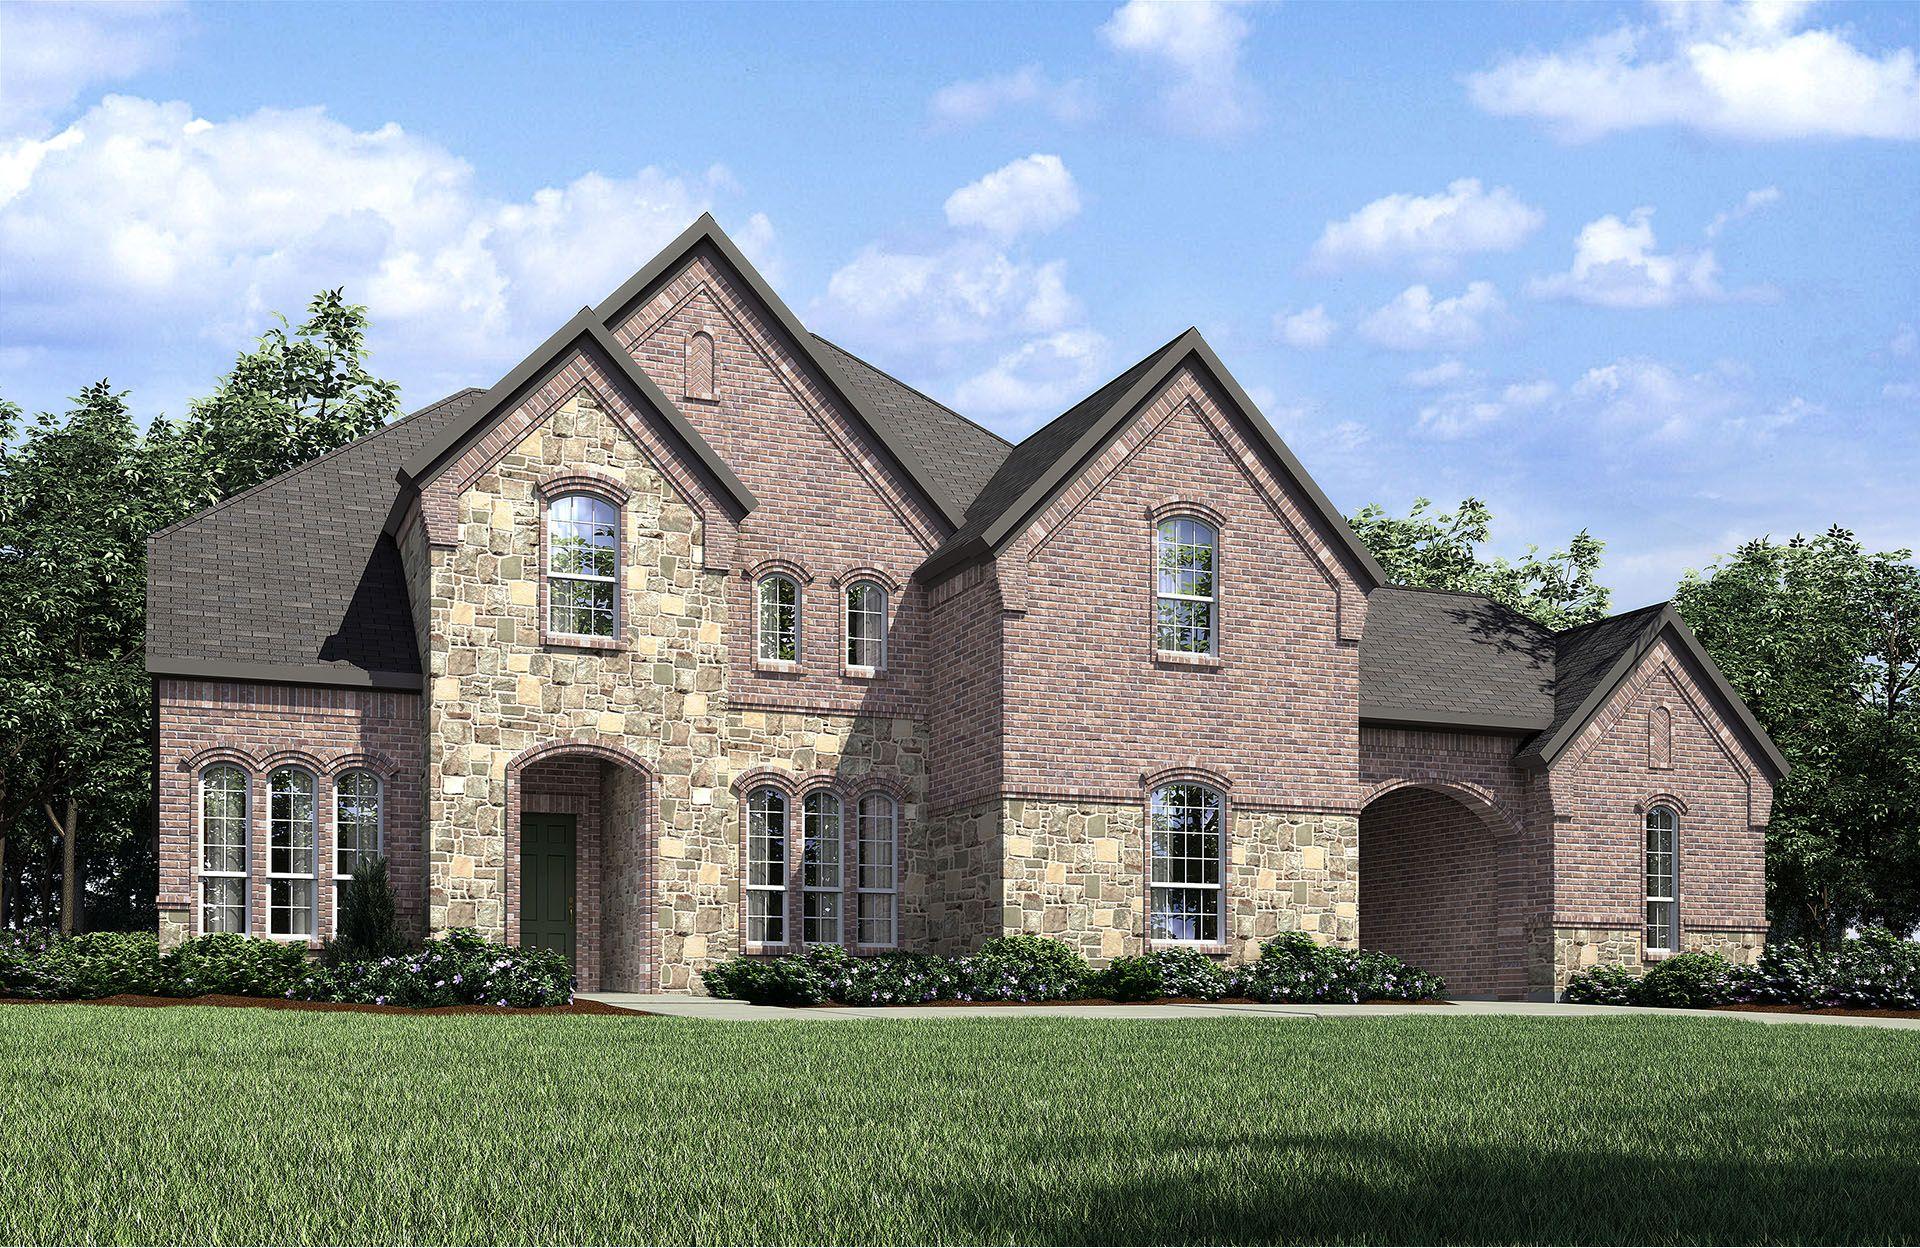 1324 BLUE RIDGE ROAD, Keller, TX Homes & Land - Real Estate